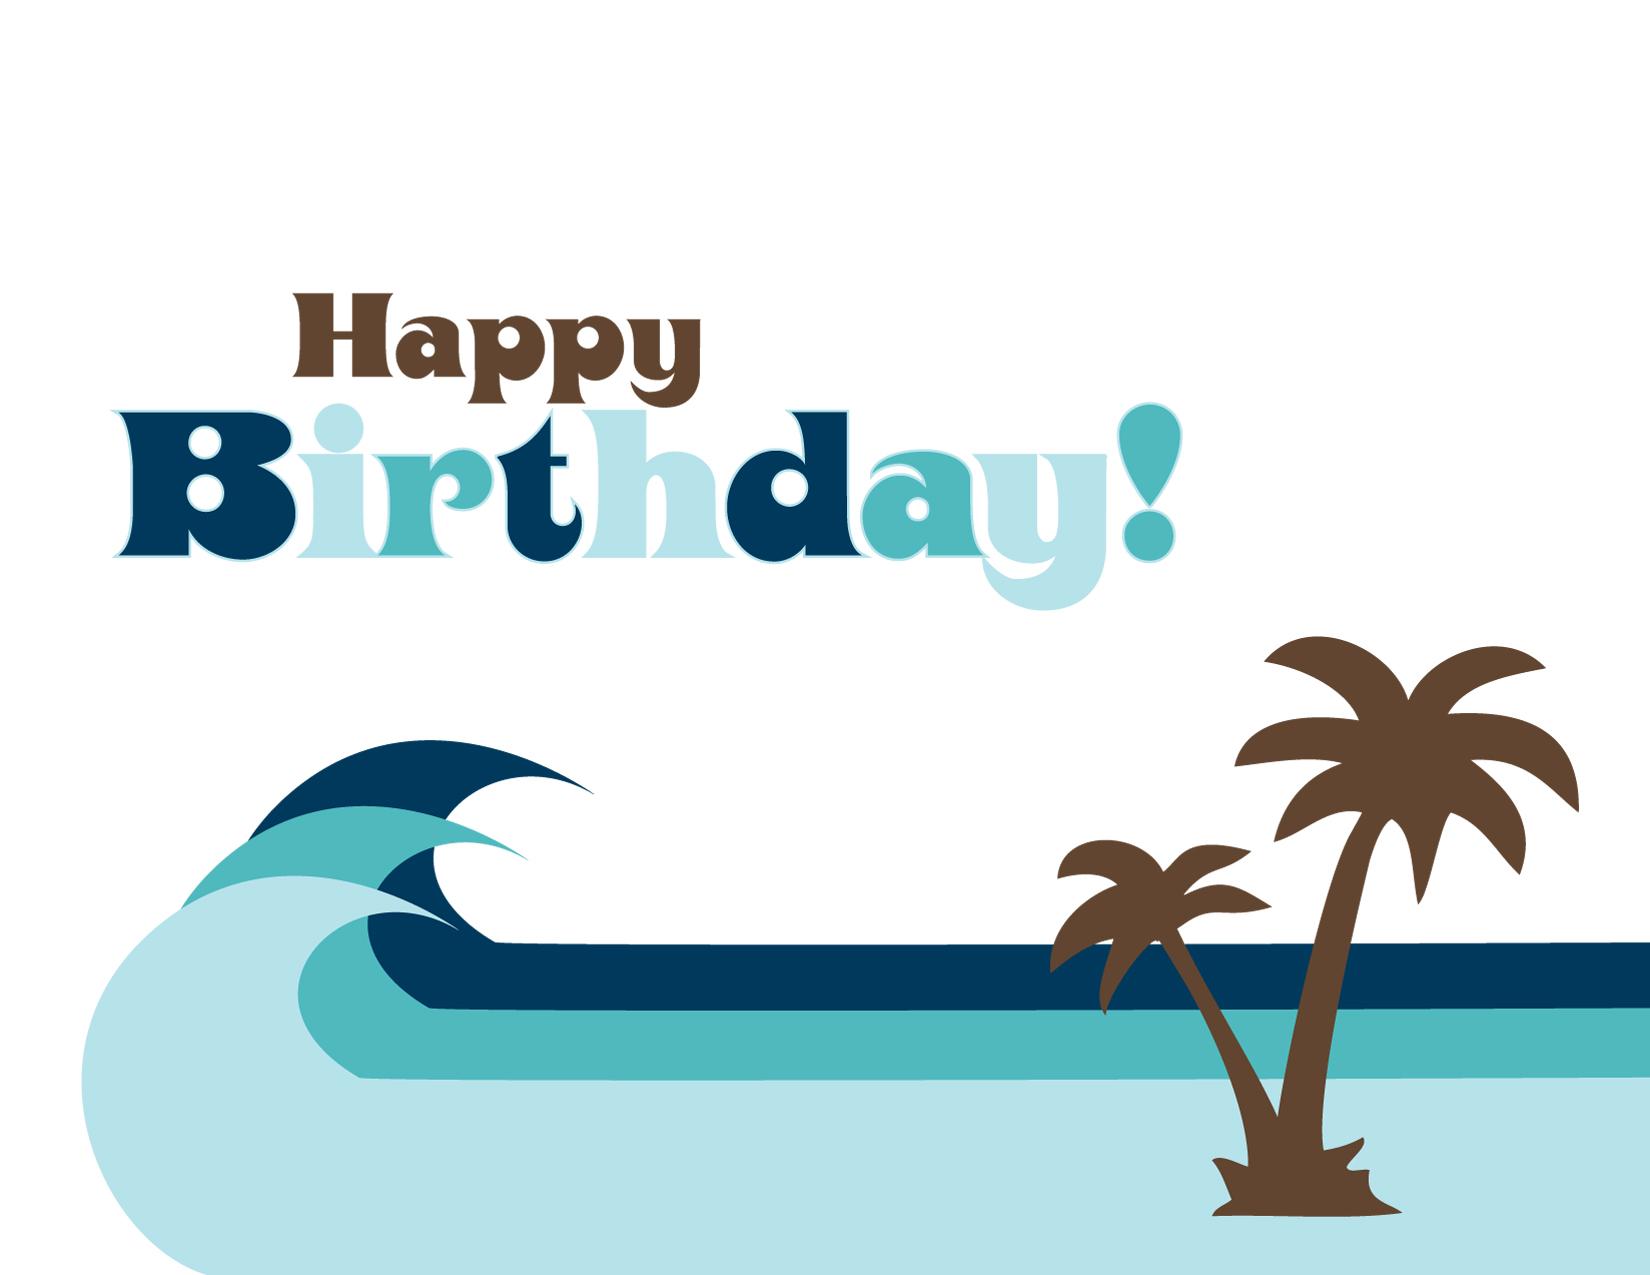 Birthday Card Sayings Beach : Beach birthday card ? paper store powered by